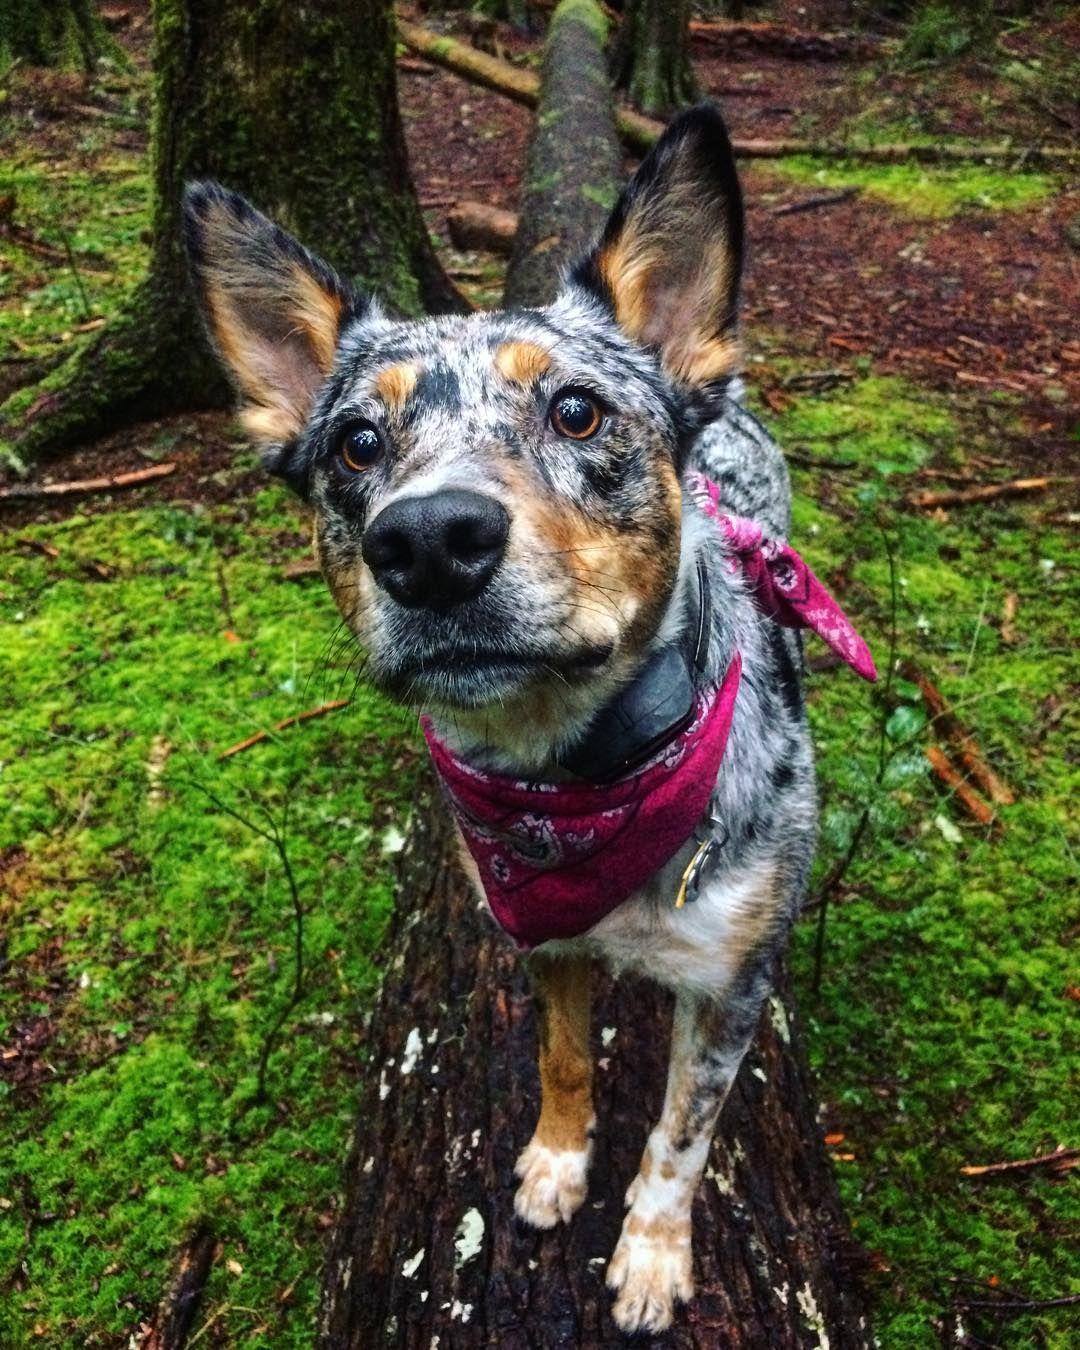 Texas Heeler Australian Shepherd Mixed Dogs & Hybrid